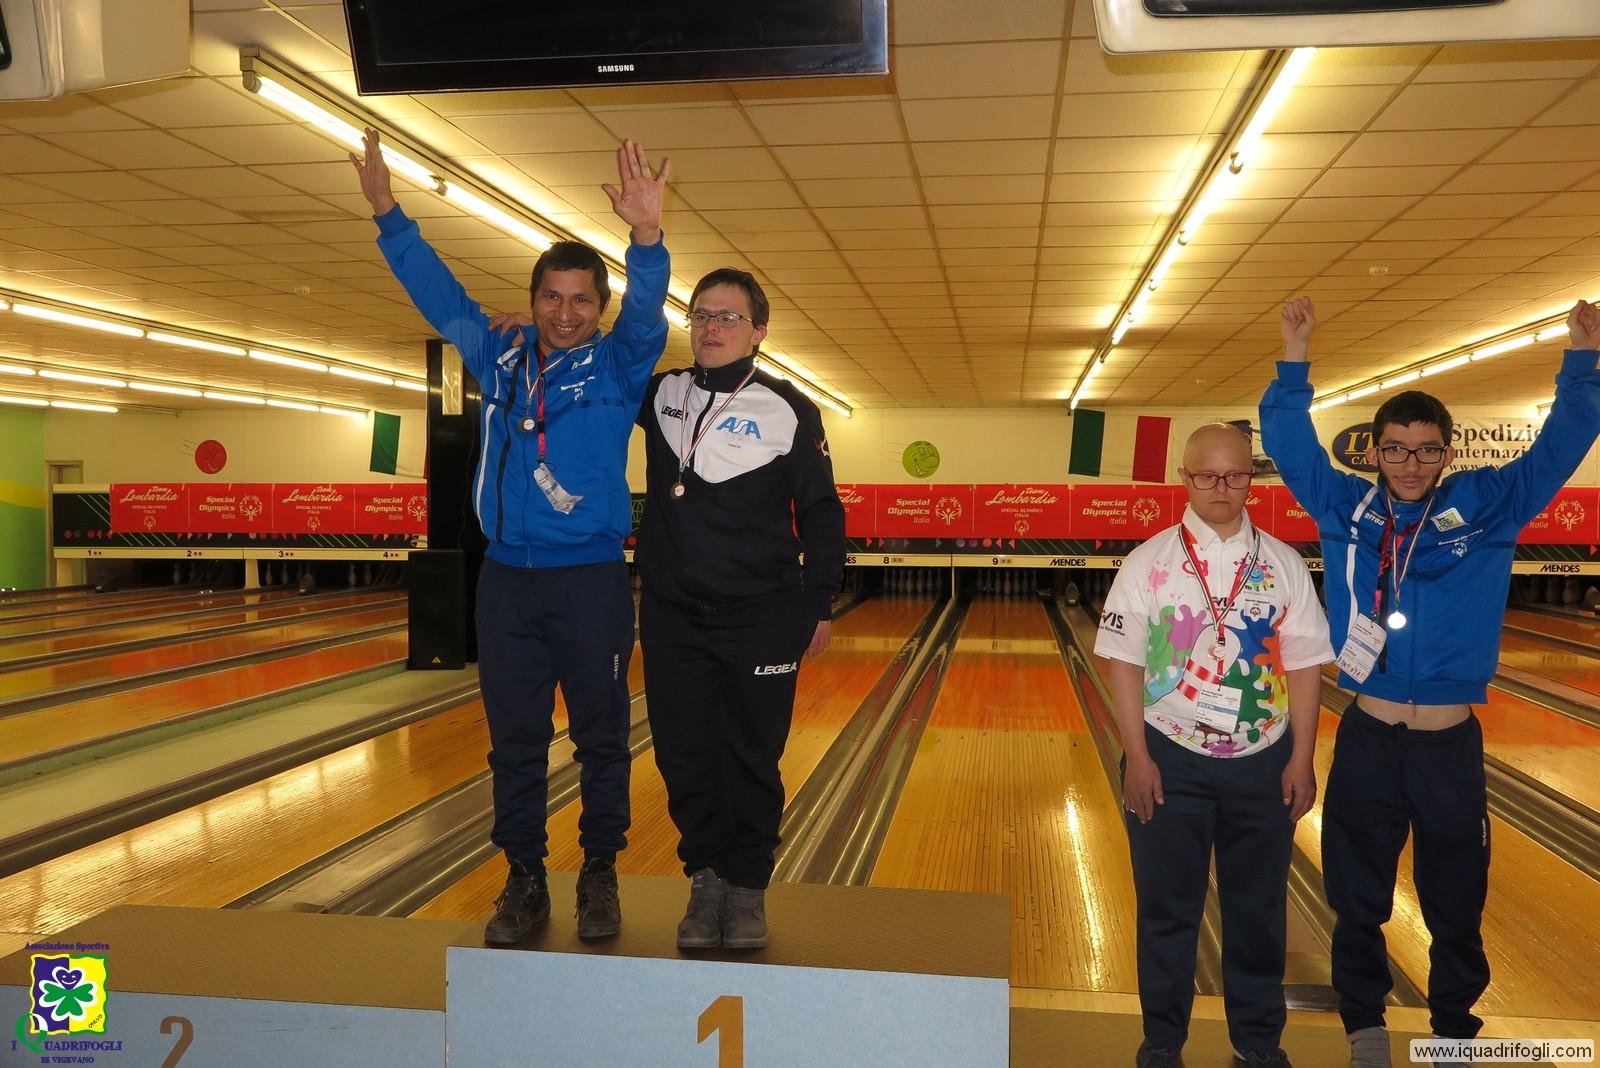 Bowling Nerviano 2019 - Regionali - 079